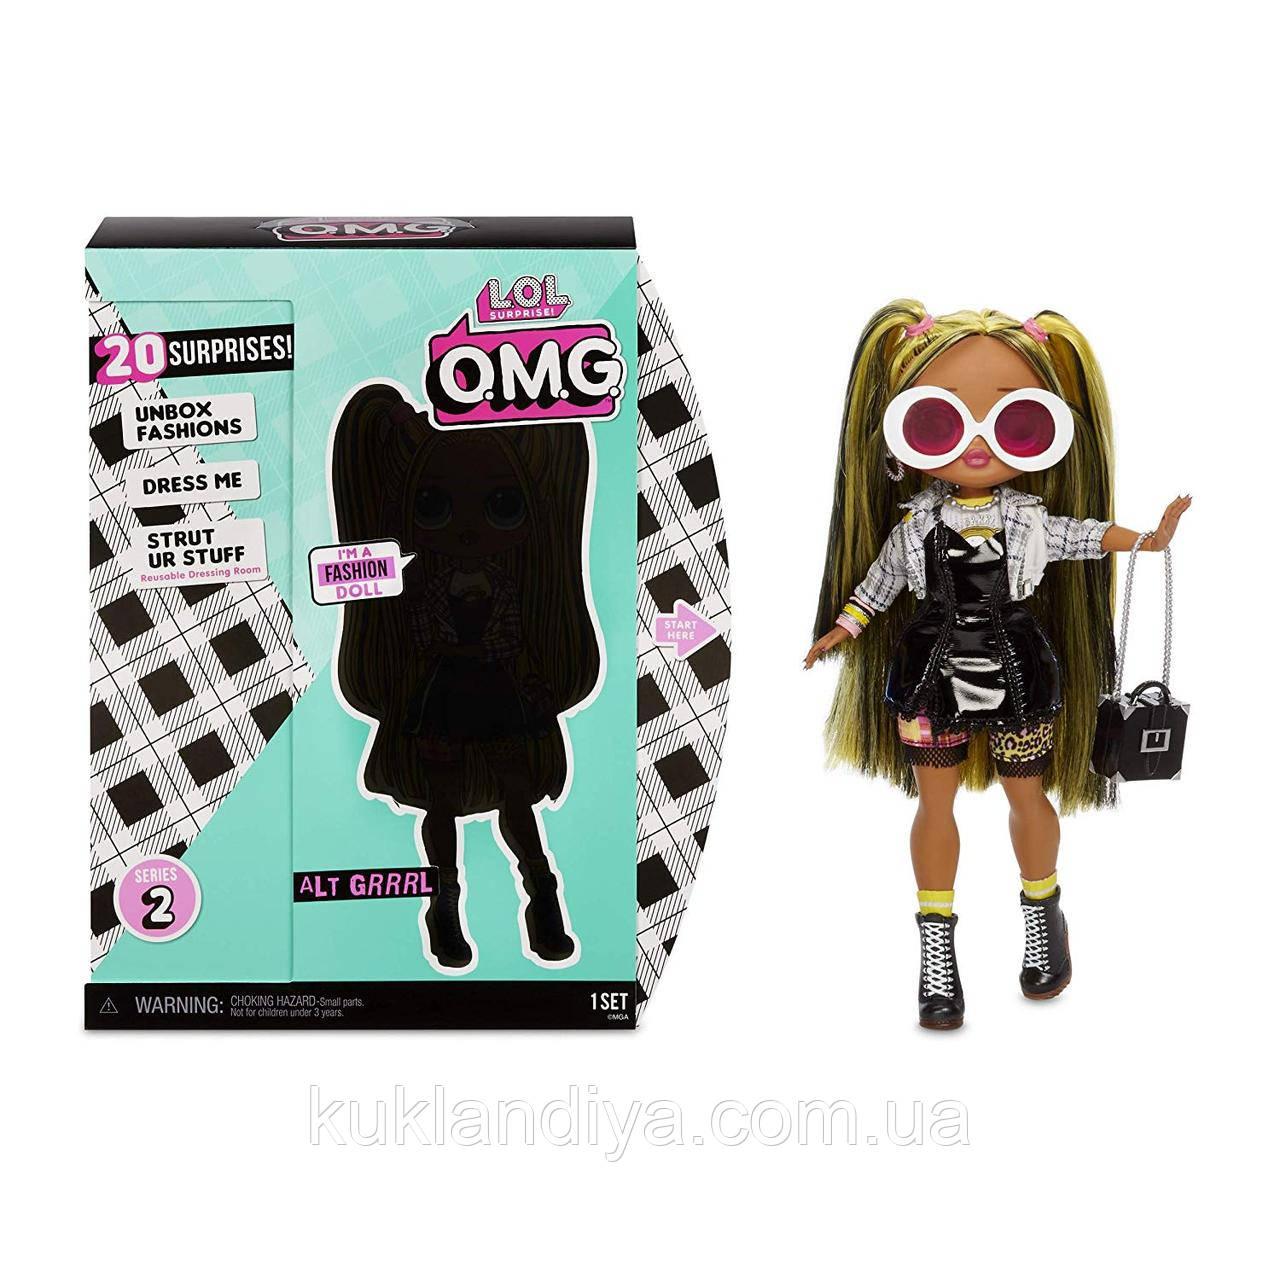 L.O.L. Surprise! O.M.G. Альт Гел Модная куколка с 20 сюрпризами